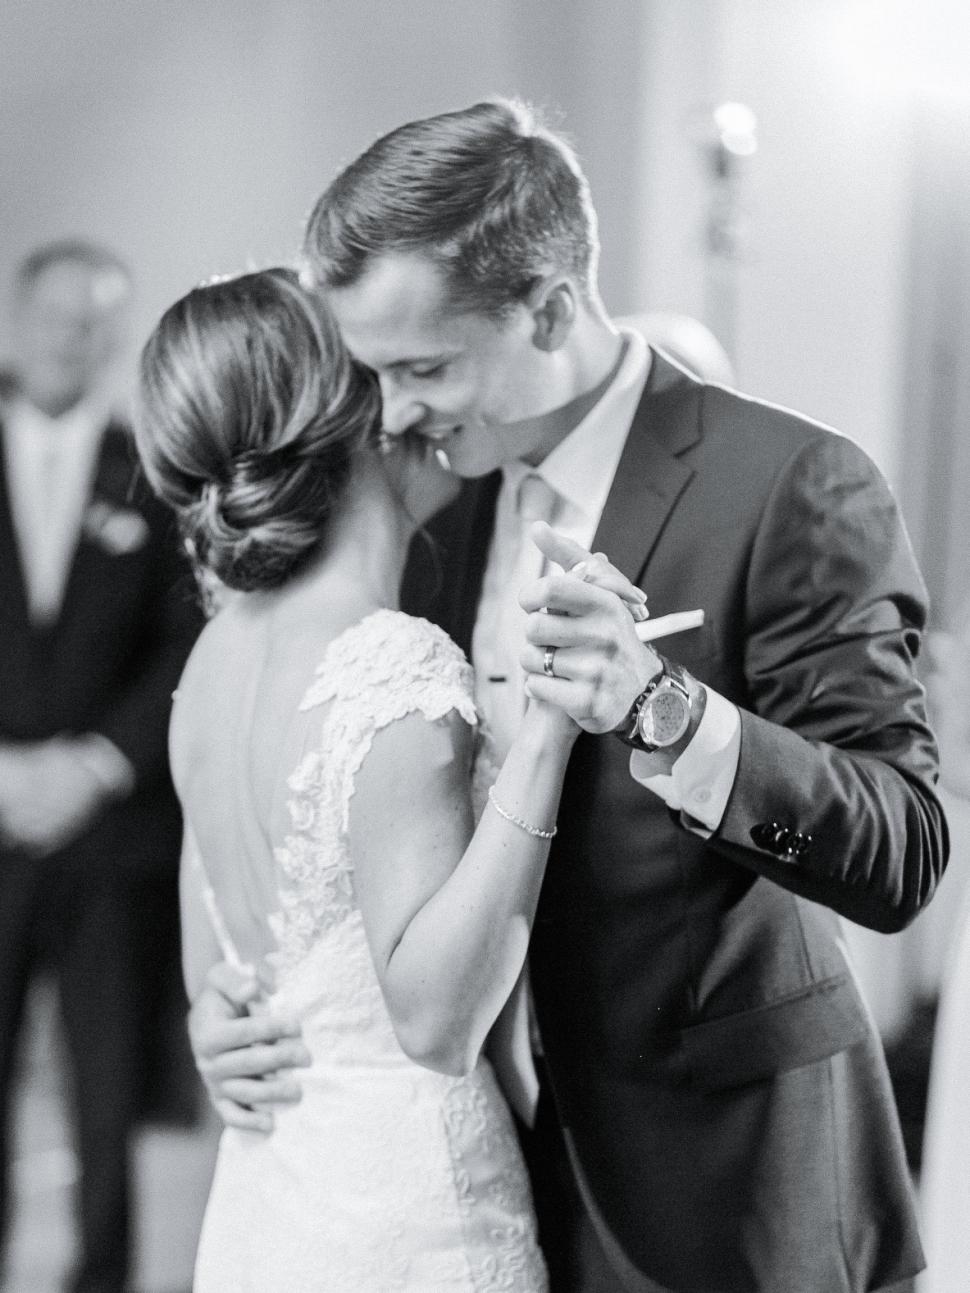 Connecticut-Wedding-Photographer-Cassi-Claire-Shorehaven-Golf-Club-Wedding_40.jpg